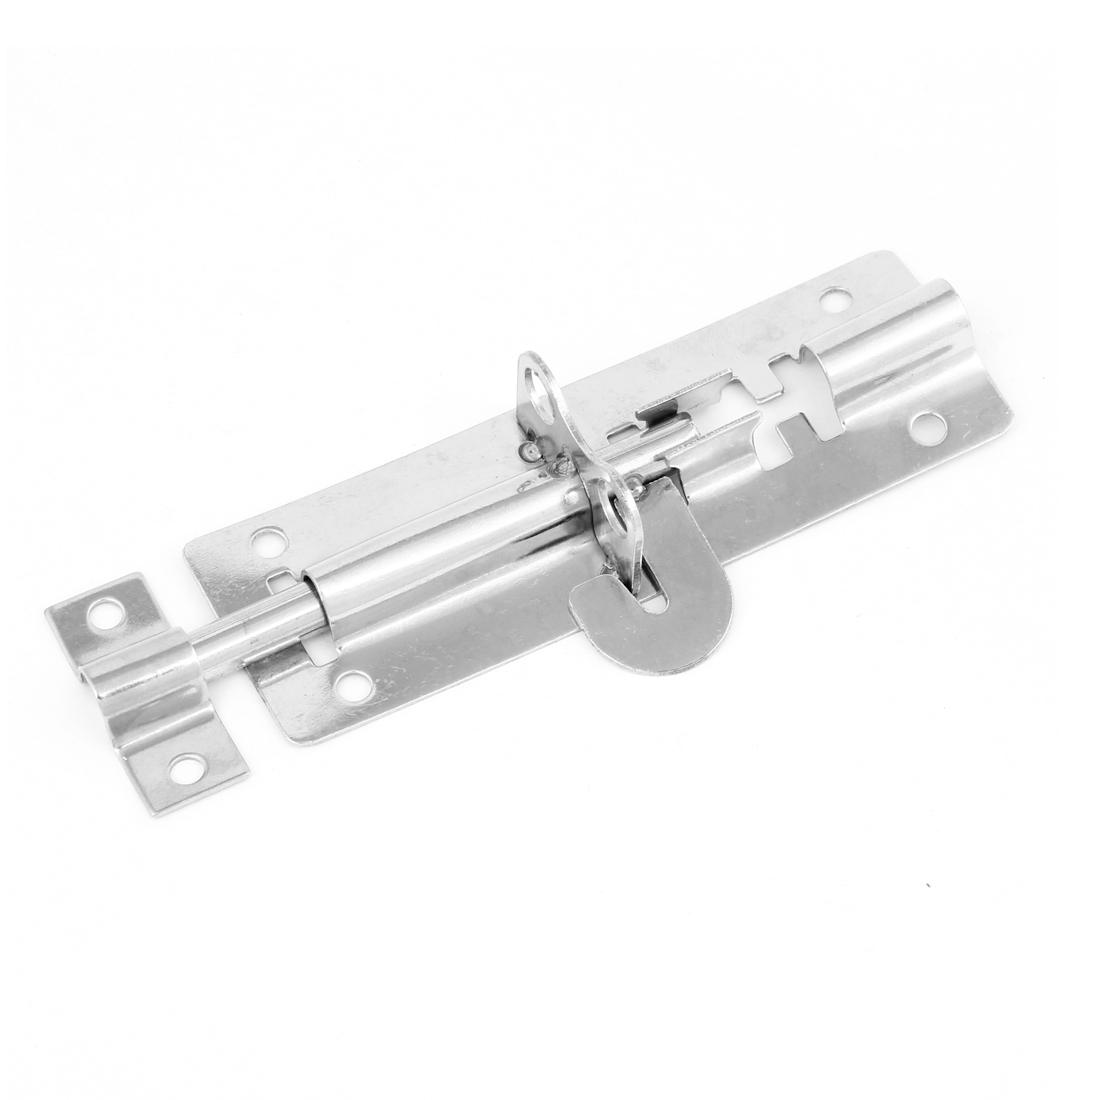 Stainless Steel Door Lock Latch Slide Barrel Bolt Clasp Set 11cm Long